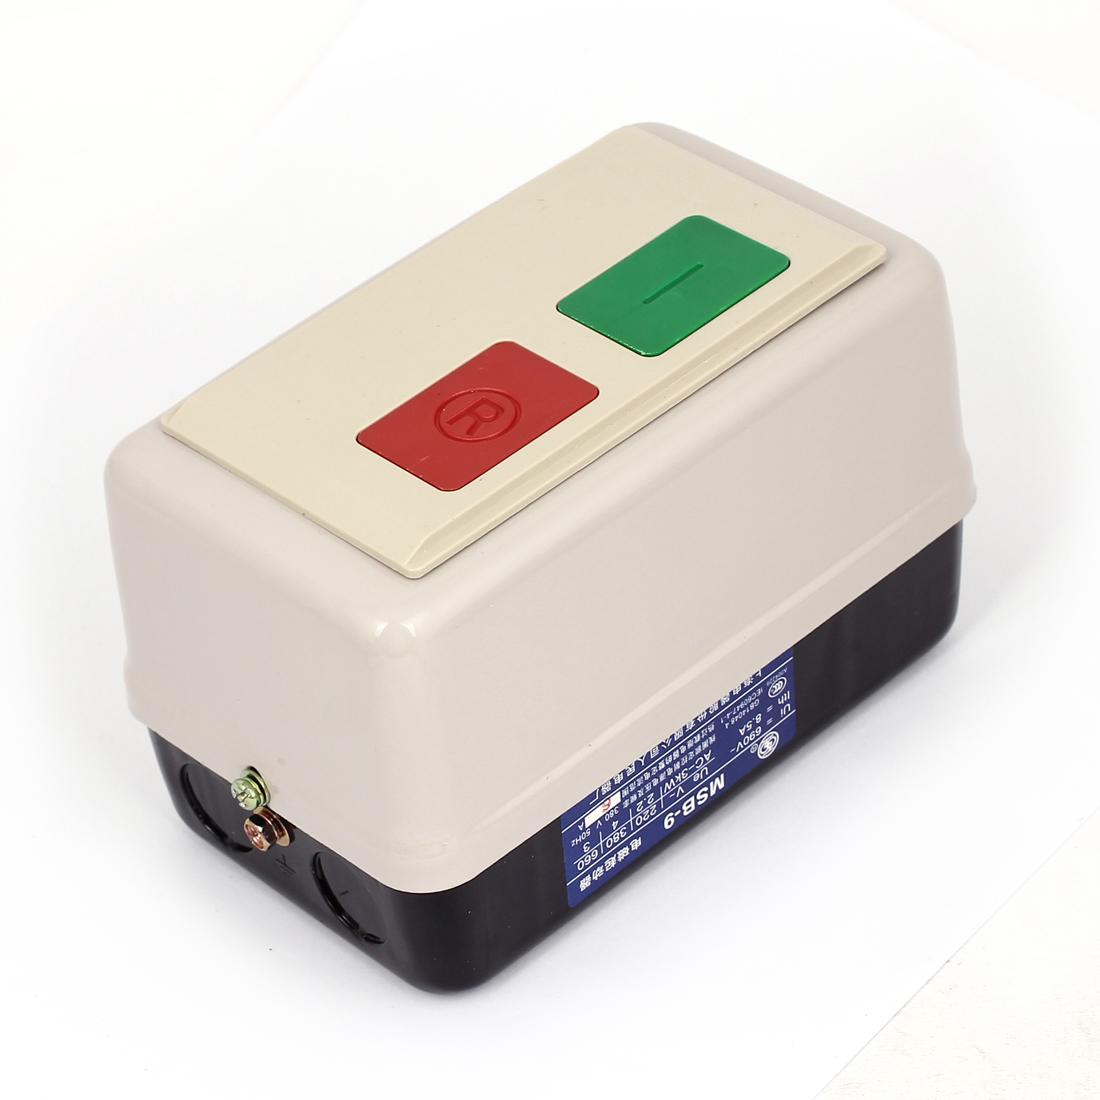 AC 220V 50Hz 4-6A Adjustable 3 Phase Electromagnetic Magnetic Starter Motor Control Contactor